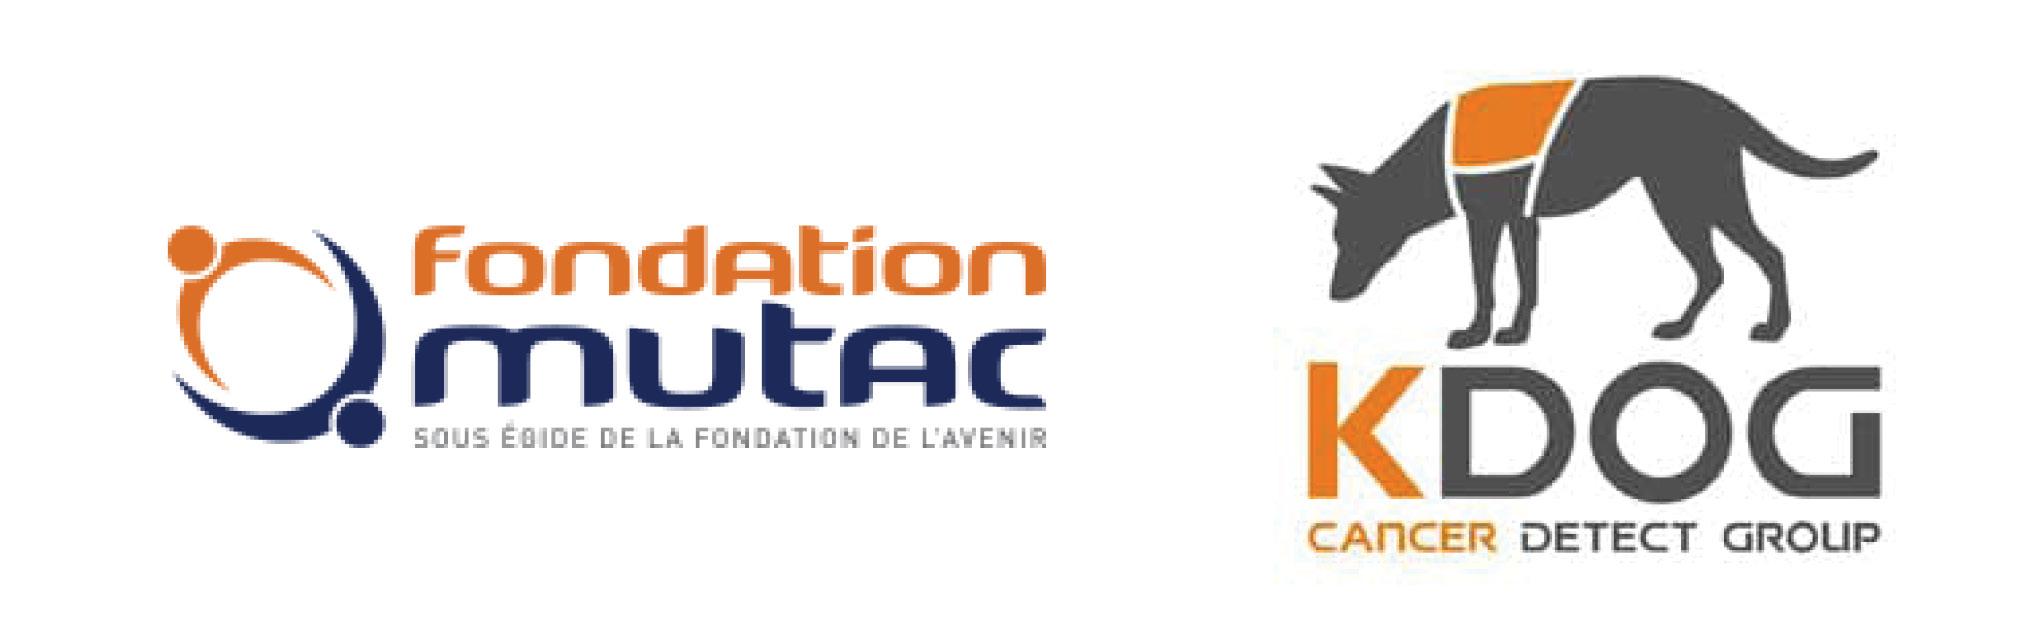 Logos Fondation MUTAC-CKDOG